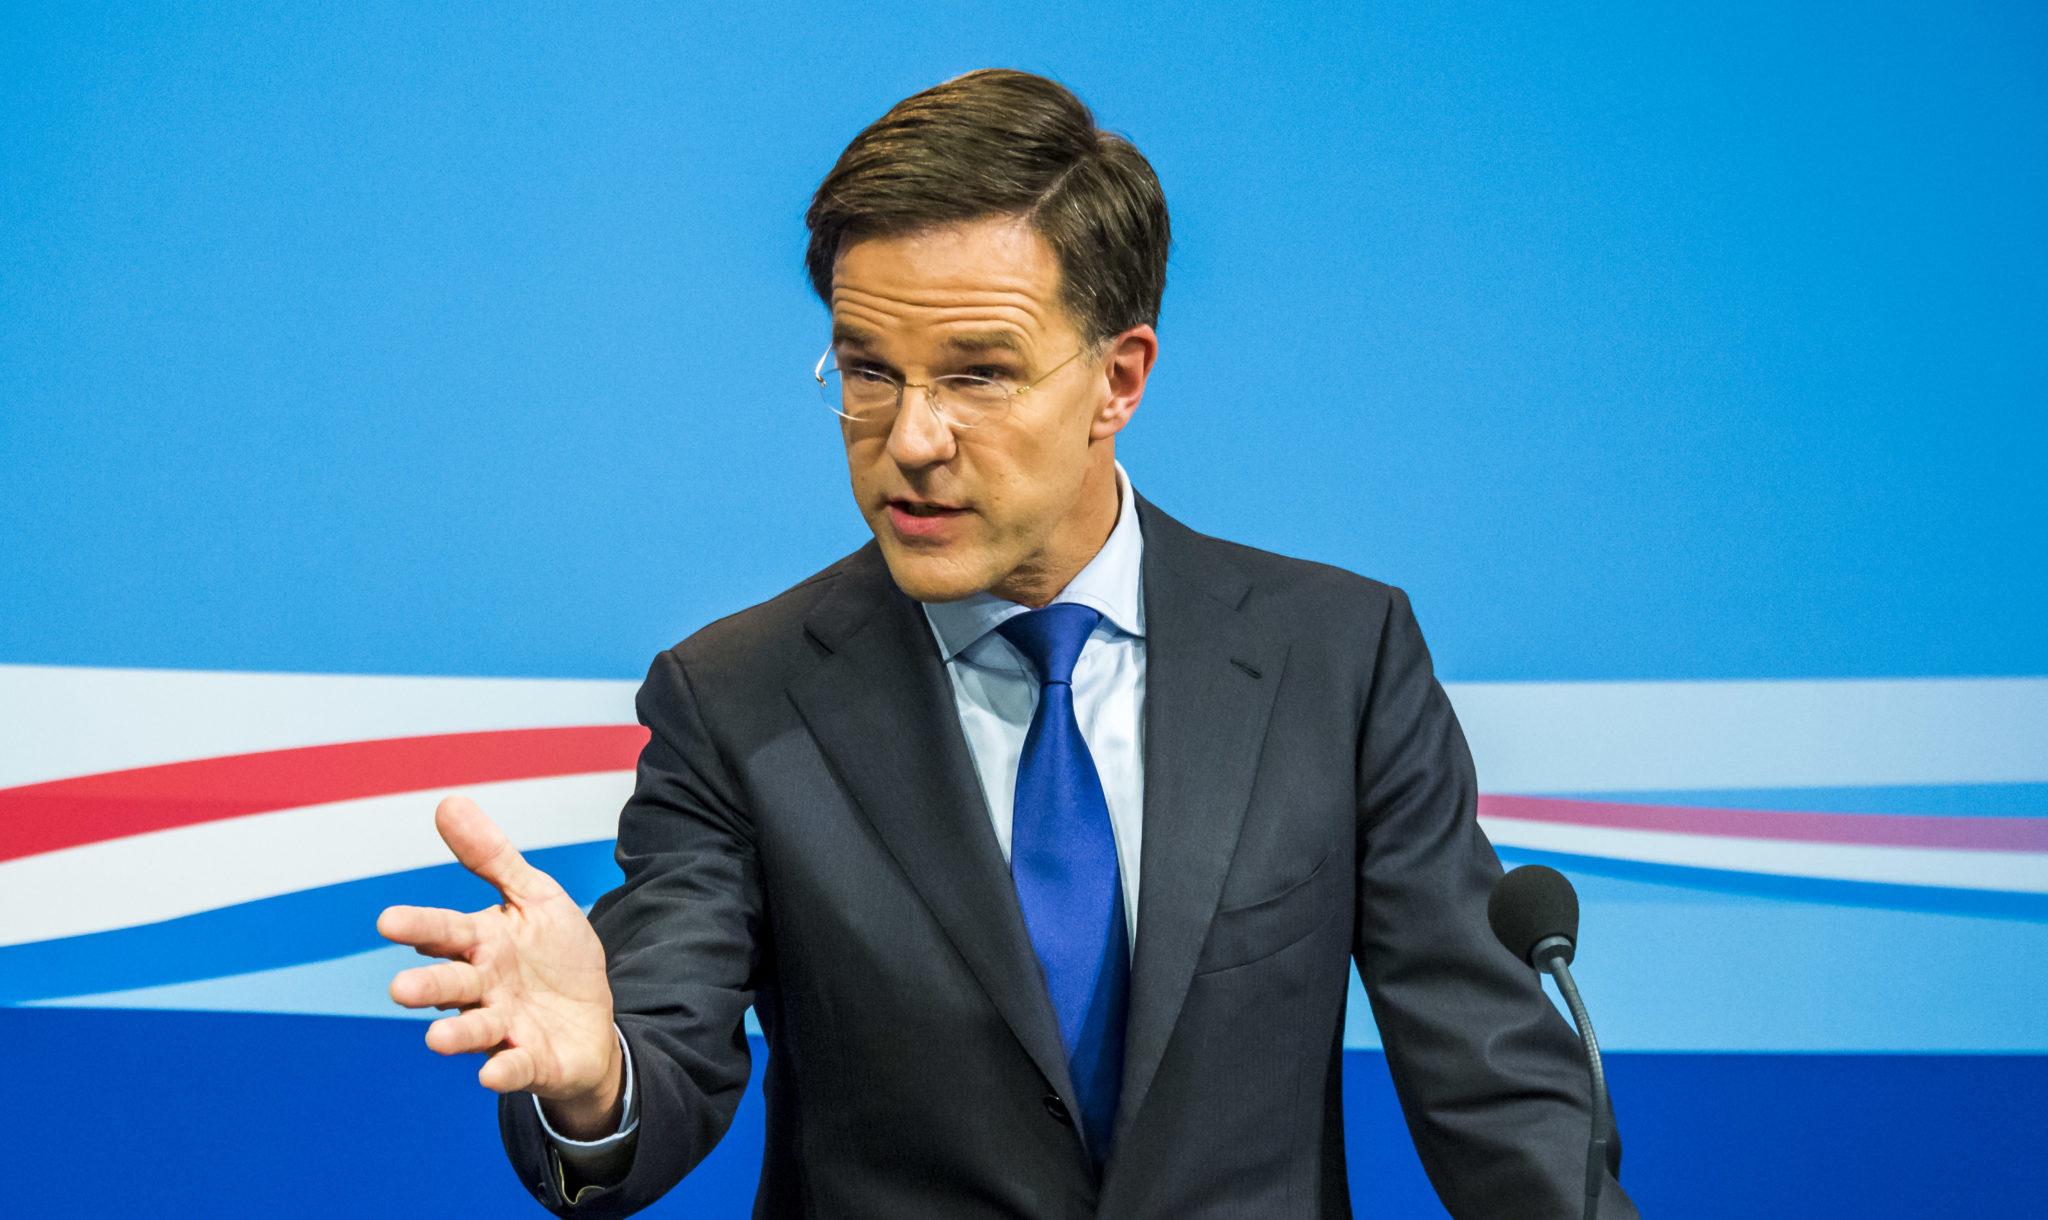 Na De Ministerraad: Rutte Wil 'klein Ego